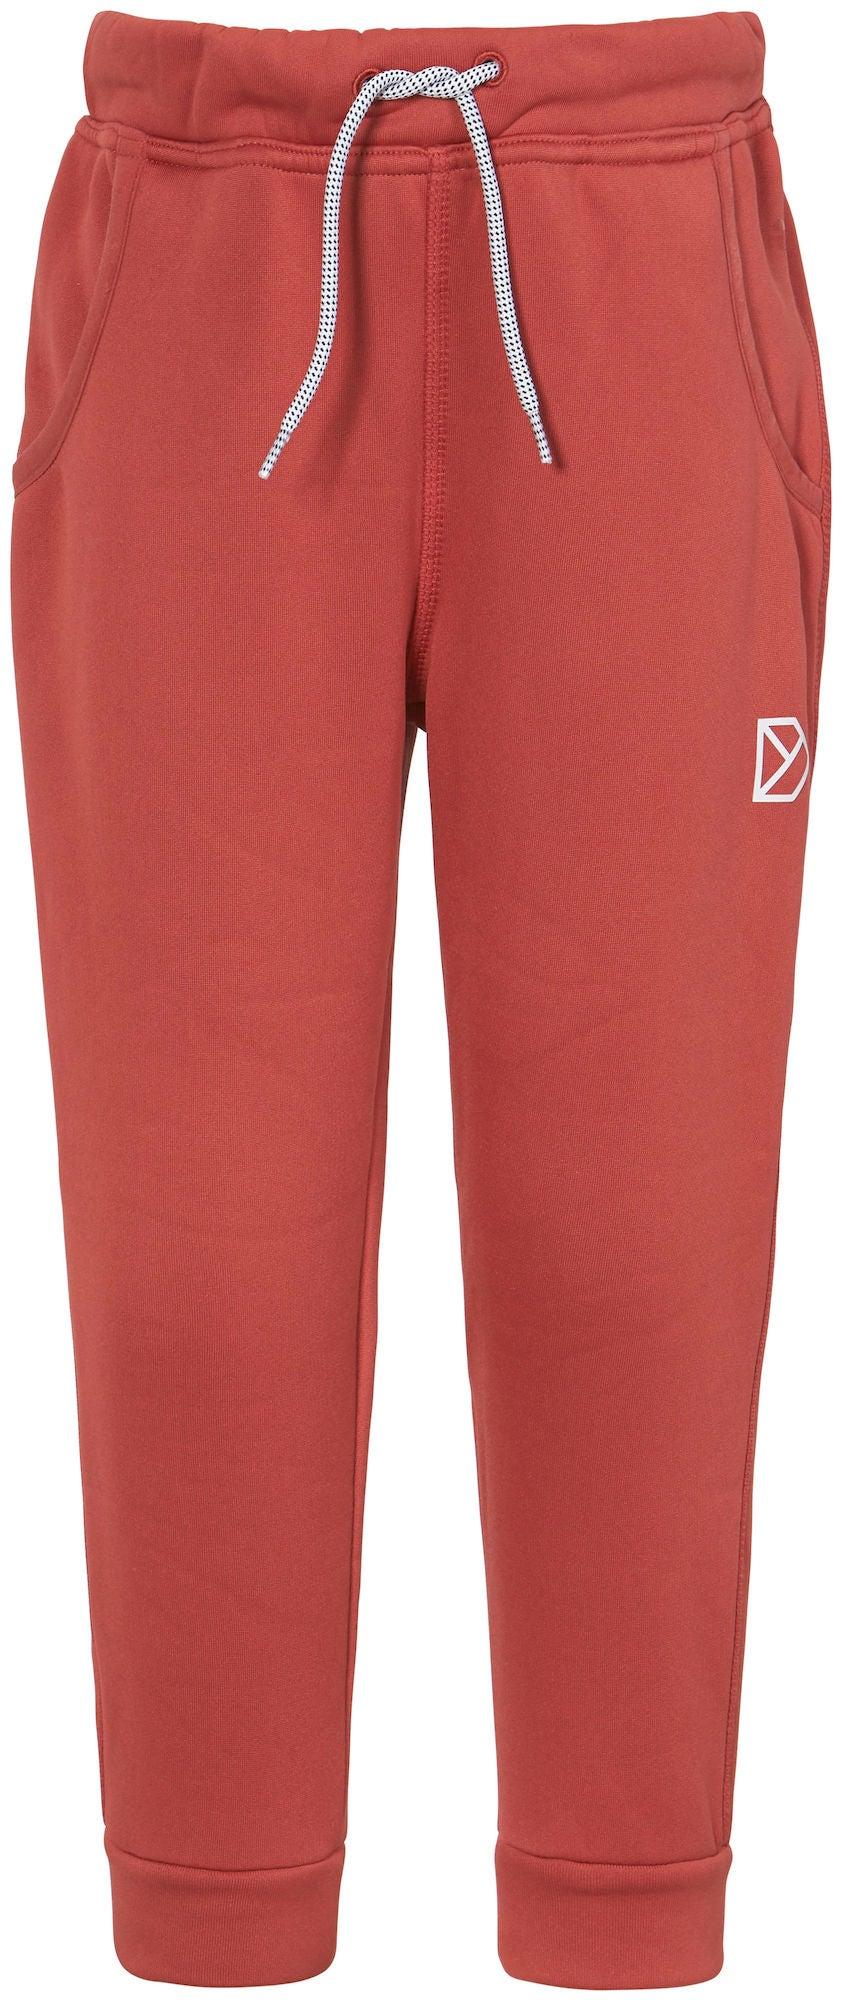 Didriksons Corin Powerstretch Byxa, Baked Pink, 80